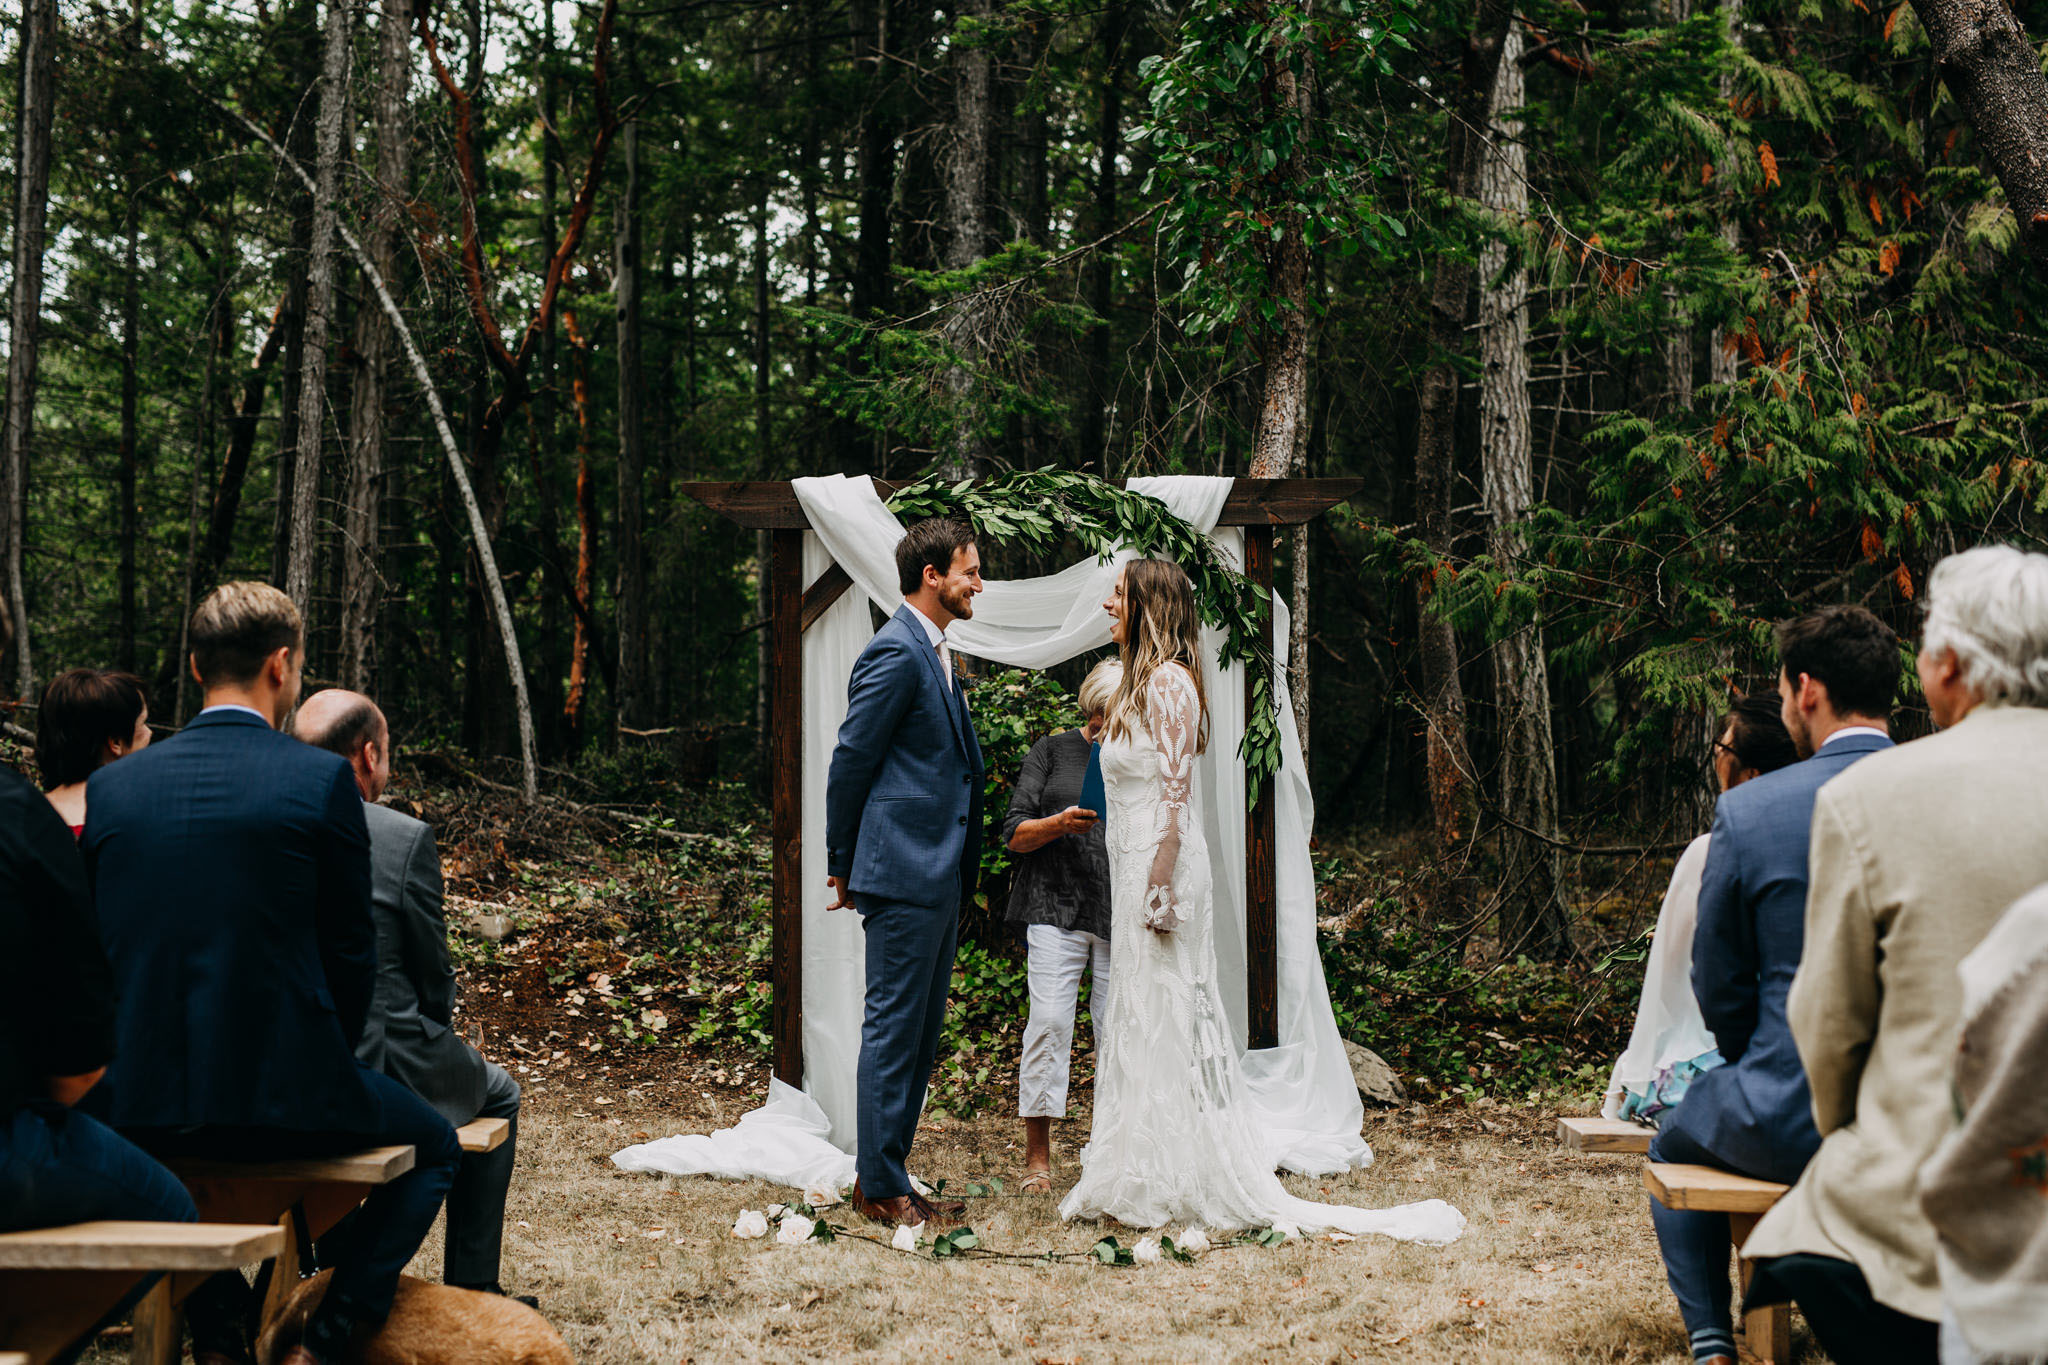 mona-rylan-mayne-island-wedding-aileen-choi-photo-web-468.jpg